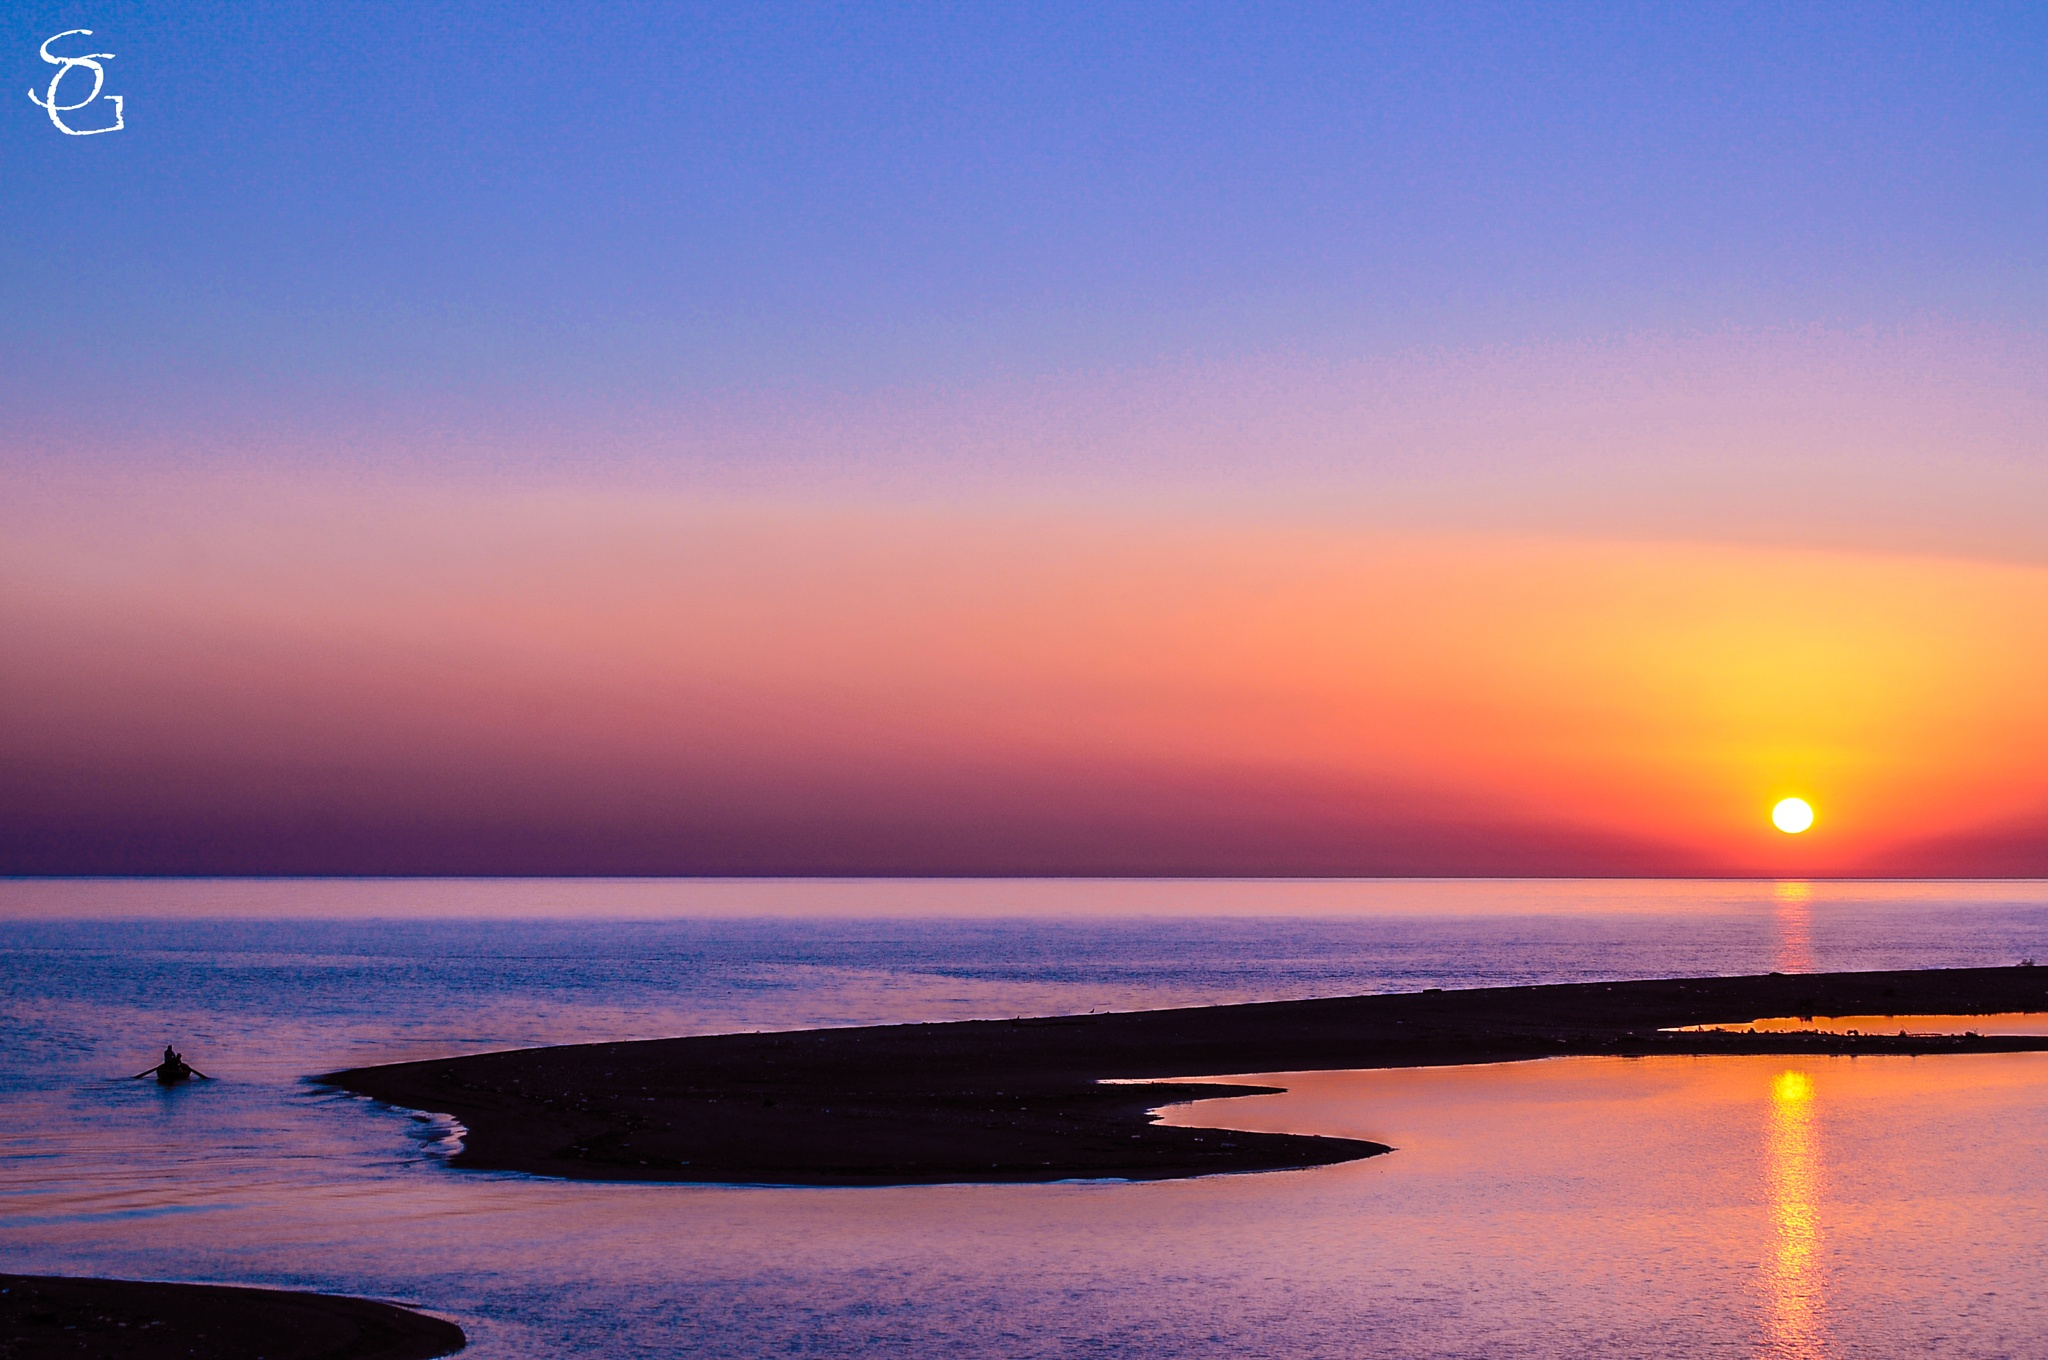 Sunset in Anaklia by Sergi Grigorian